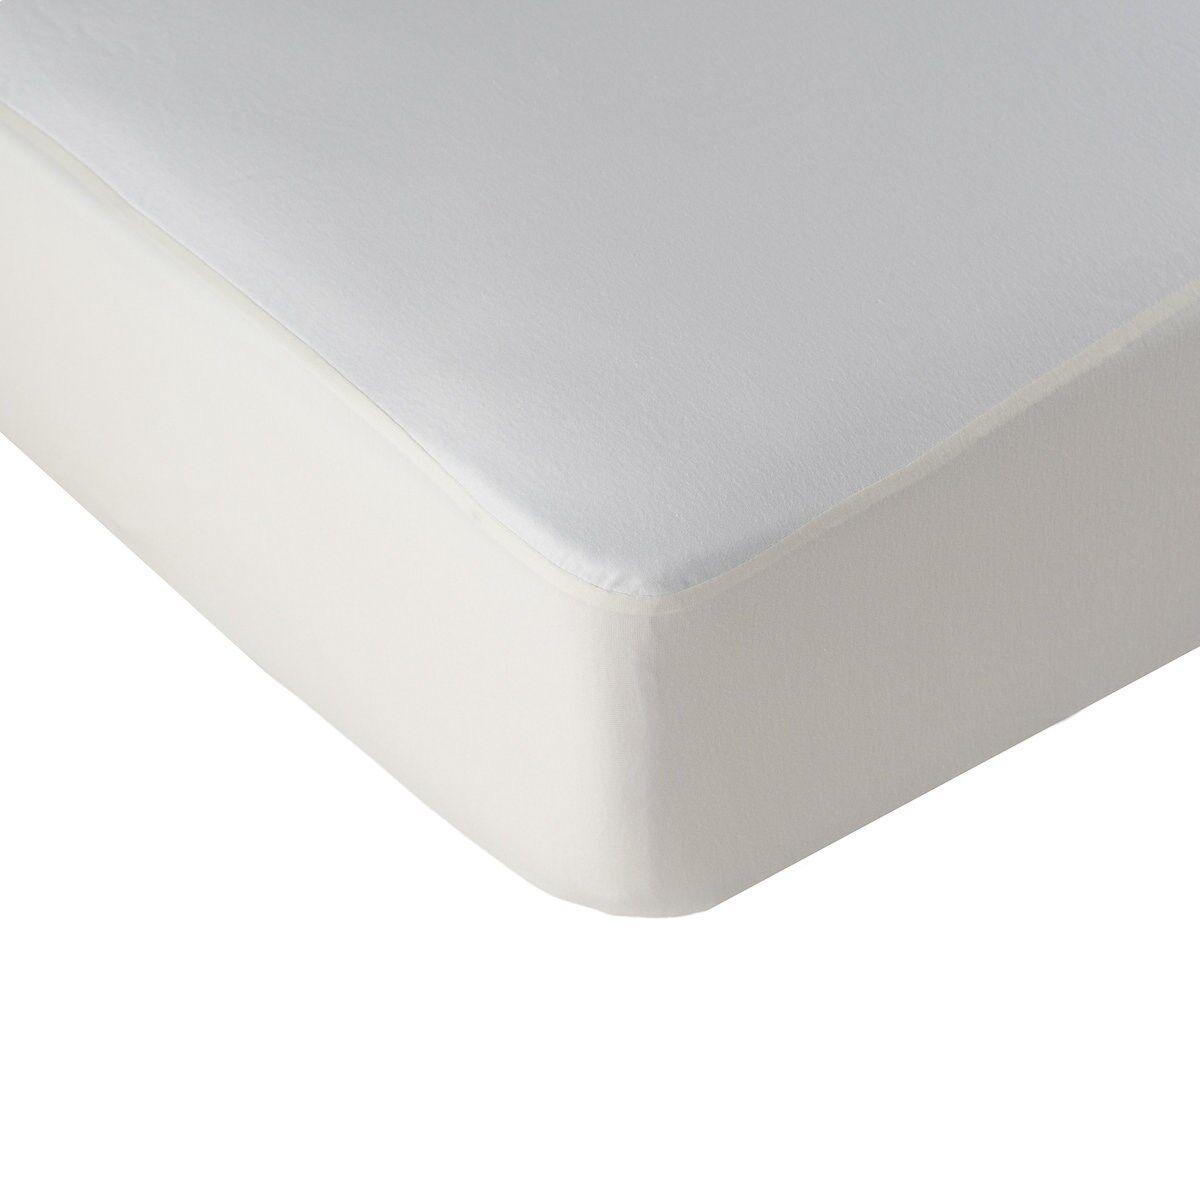 Linandelle Alèse protège matelas respirante en coton blanc 80x190 cm